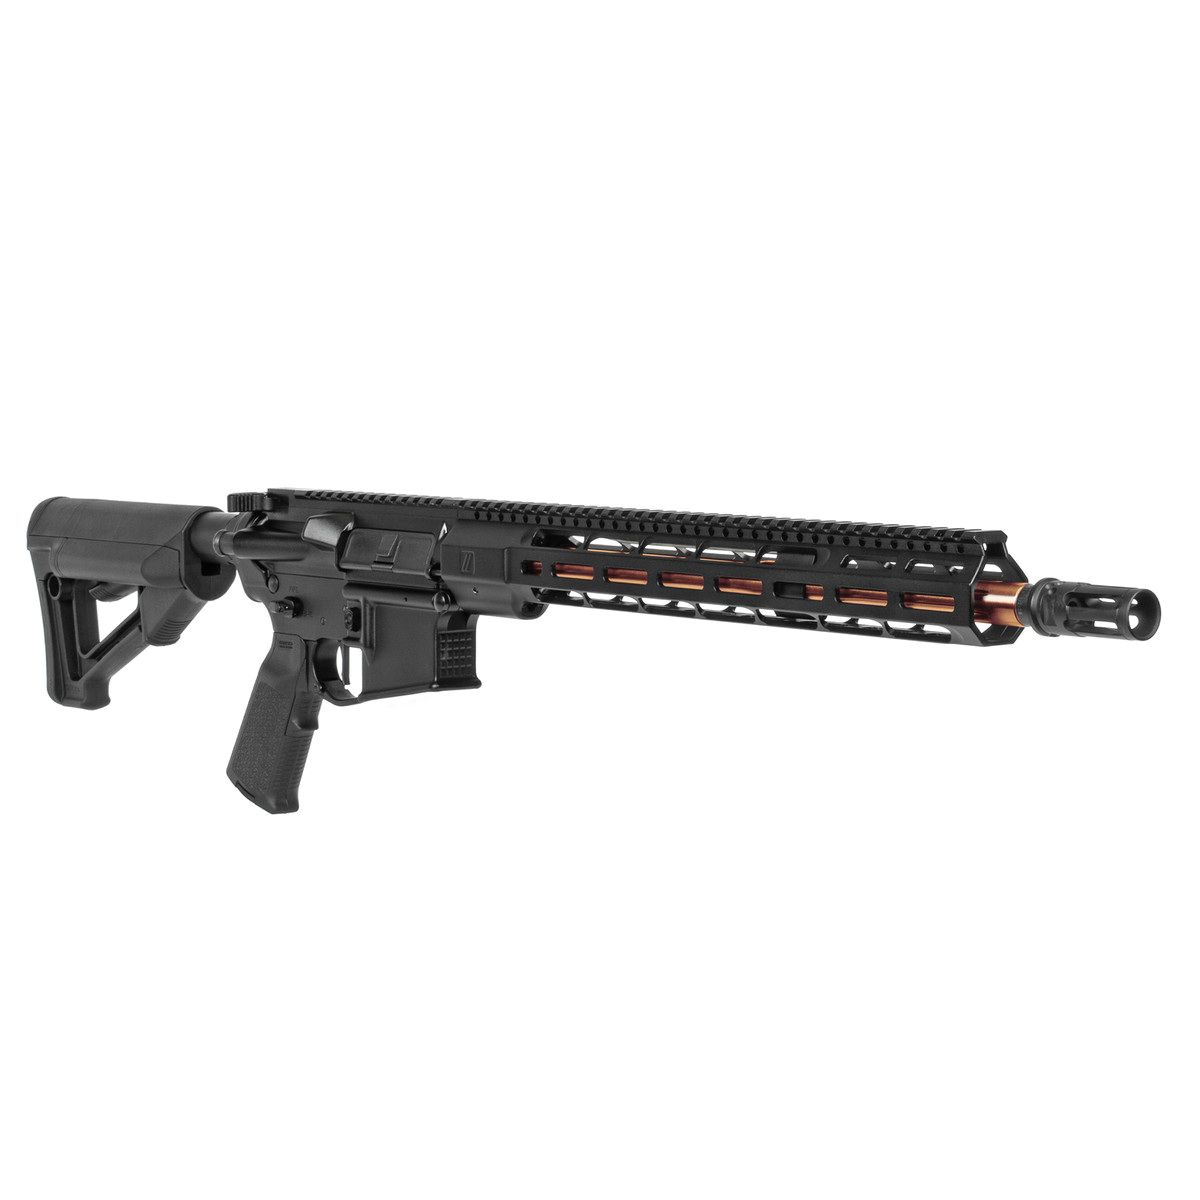 Zevtech Core Elite 223 Rem 5 56 Semi Automatic Ar 15 Rifle Ar15 Ce 556 16 B Palmetto State Armory